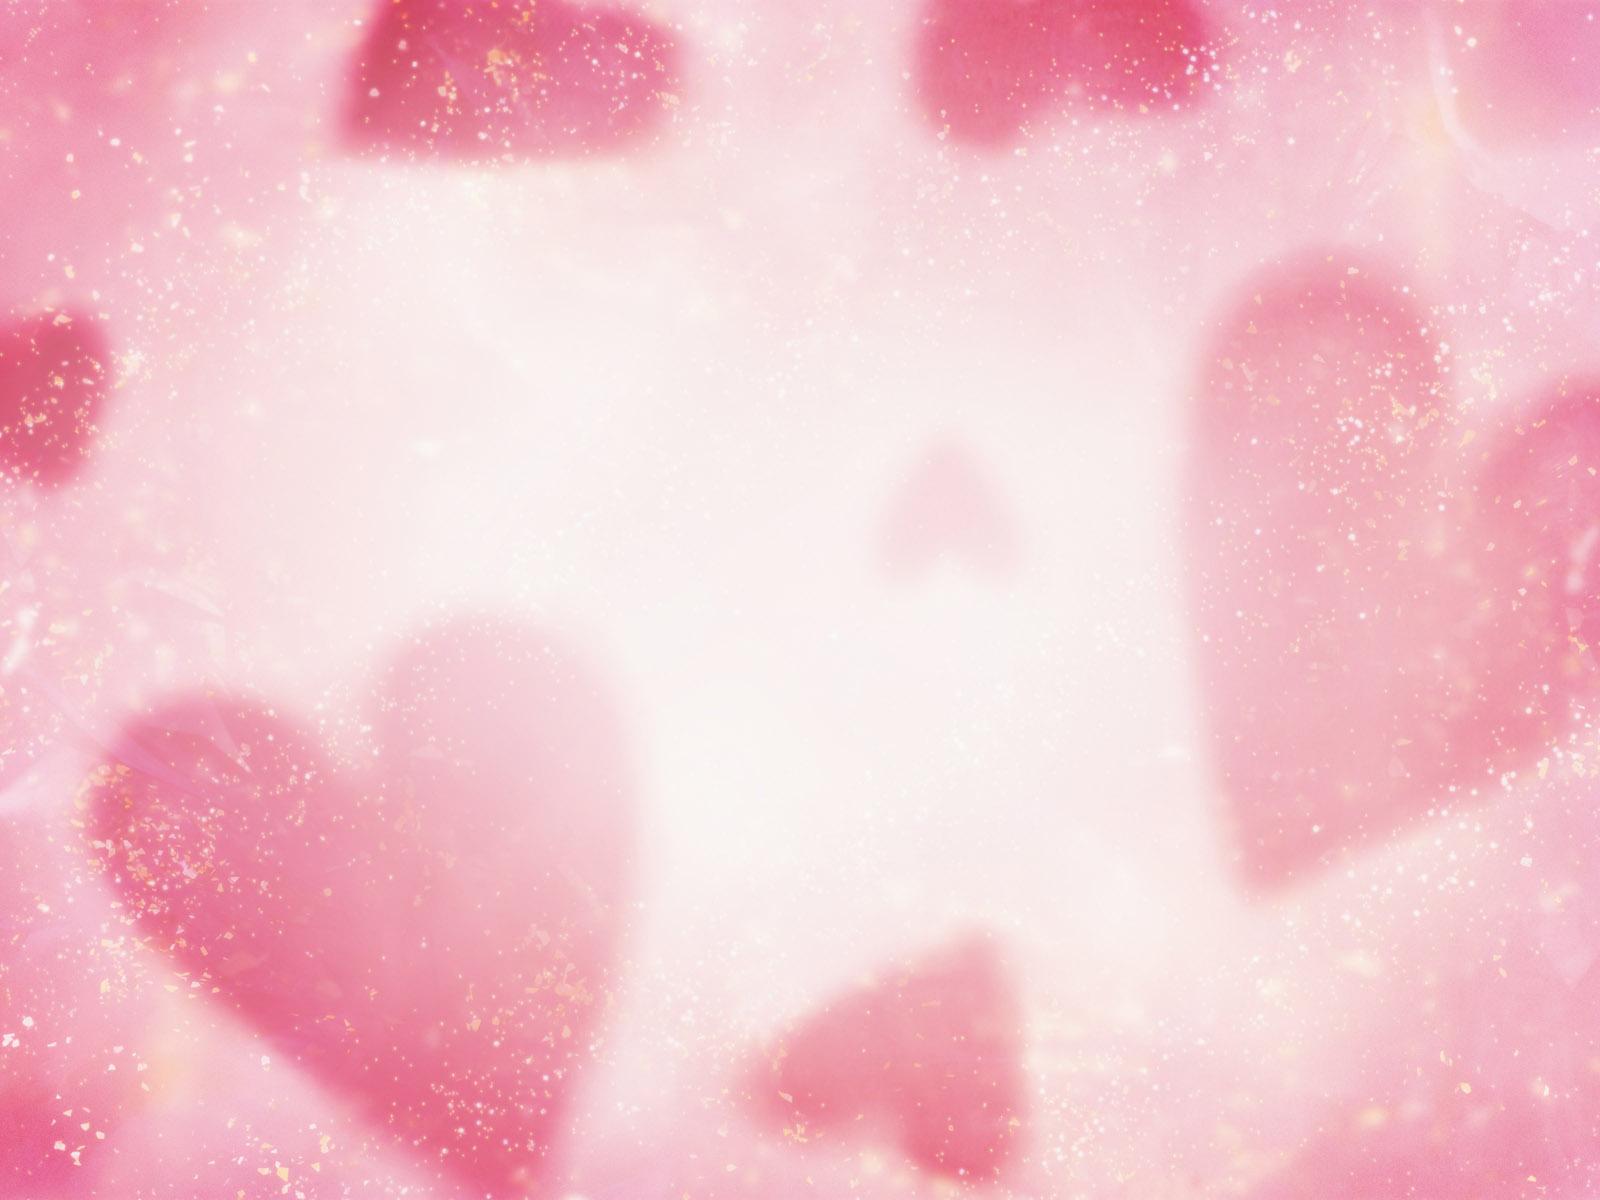 Falling Little Hearts Wallpapers HD Wallpapers 1600x1200